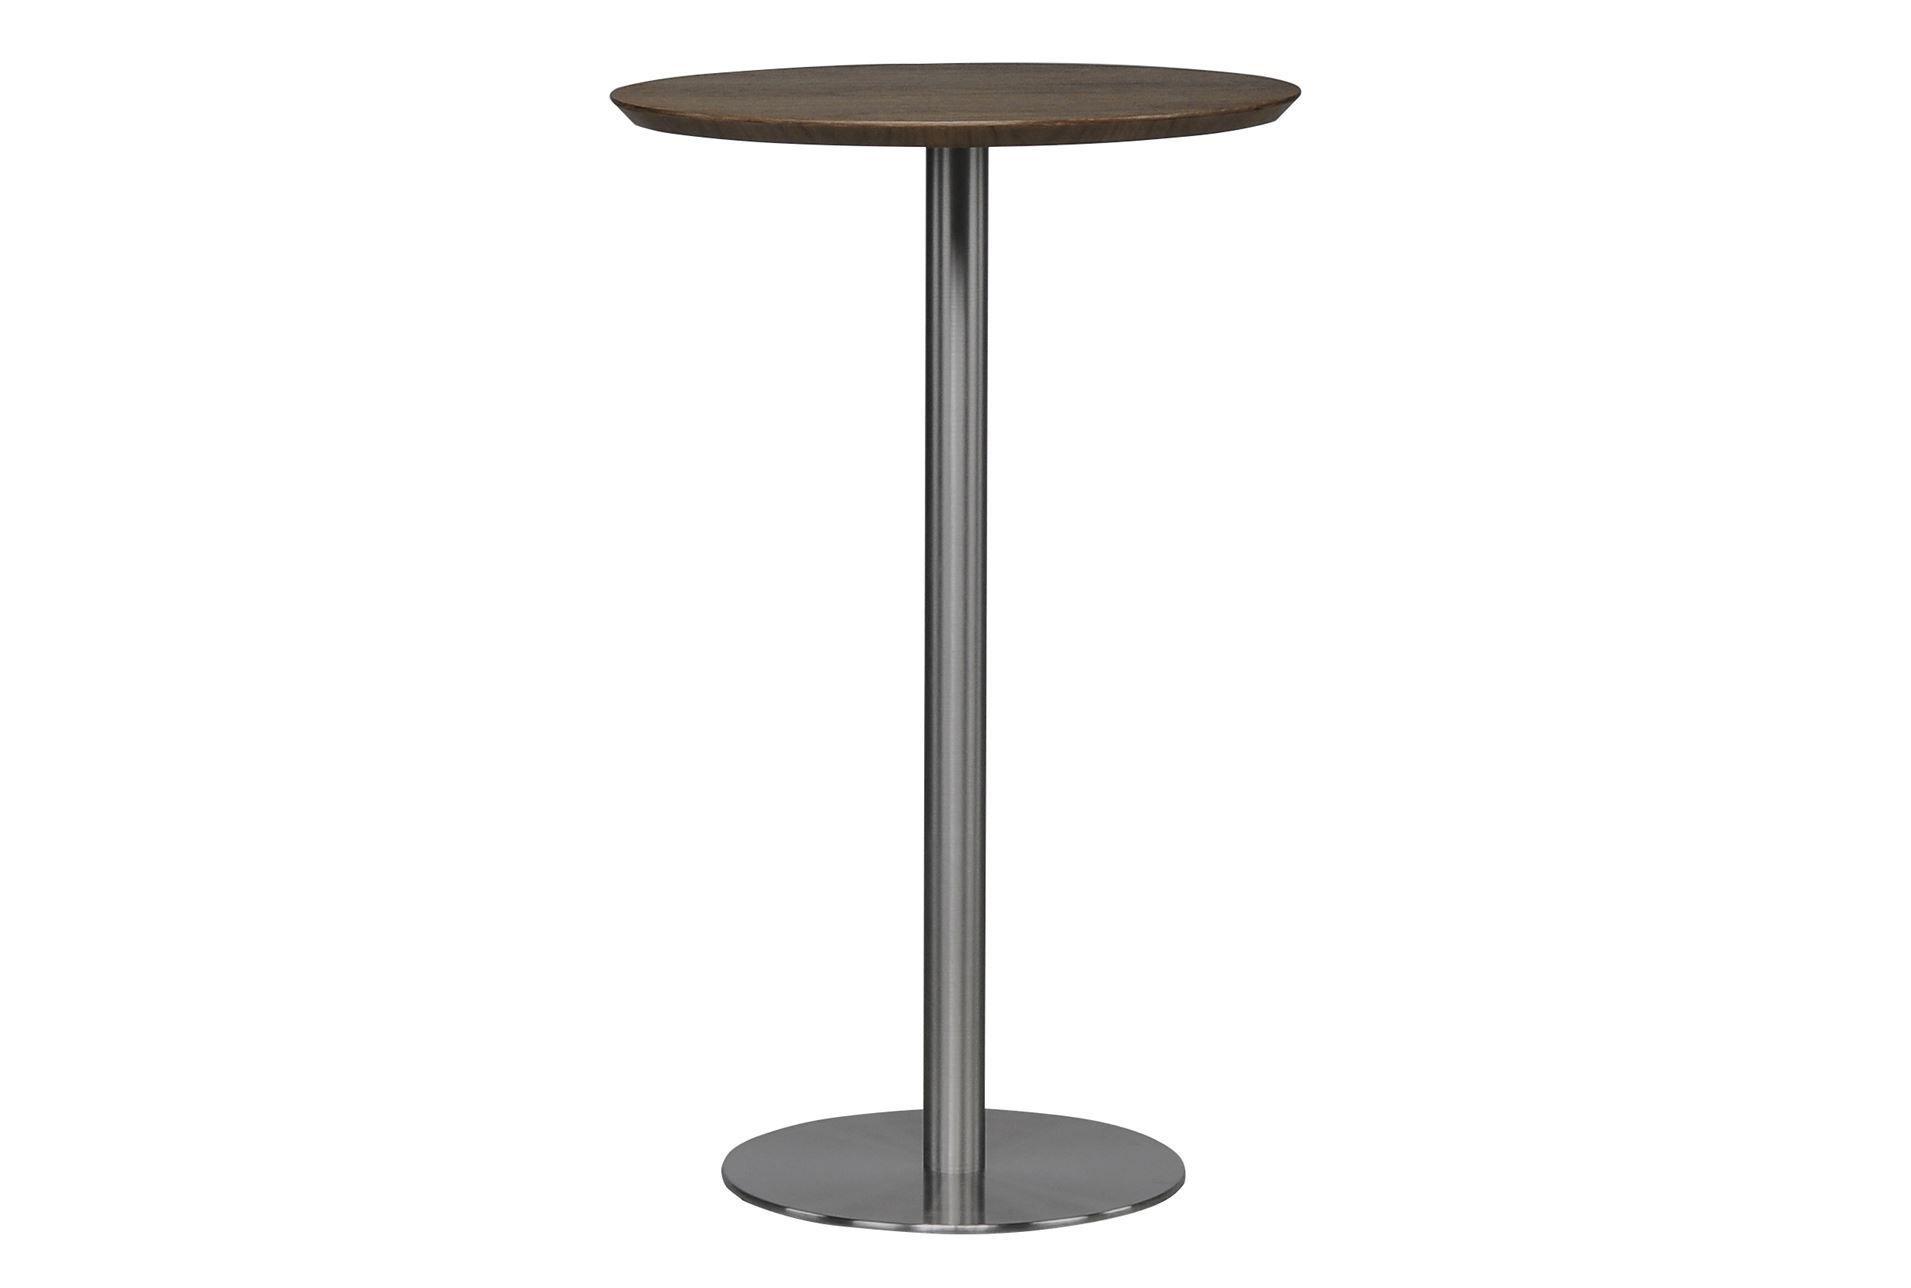 "Faye Bar Table - Signature 25.6""W x 25.6""D x 41.3""H $250"